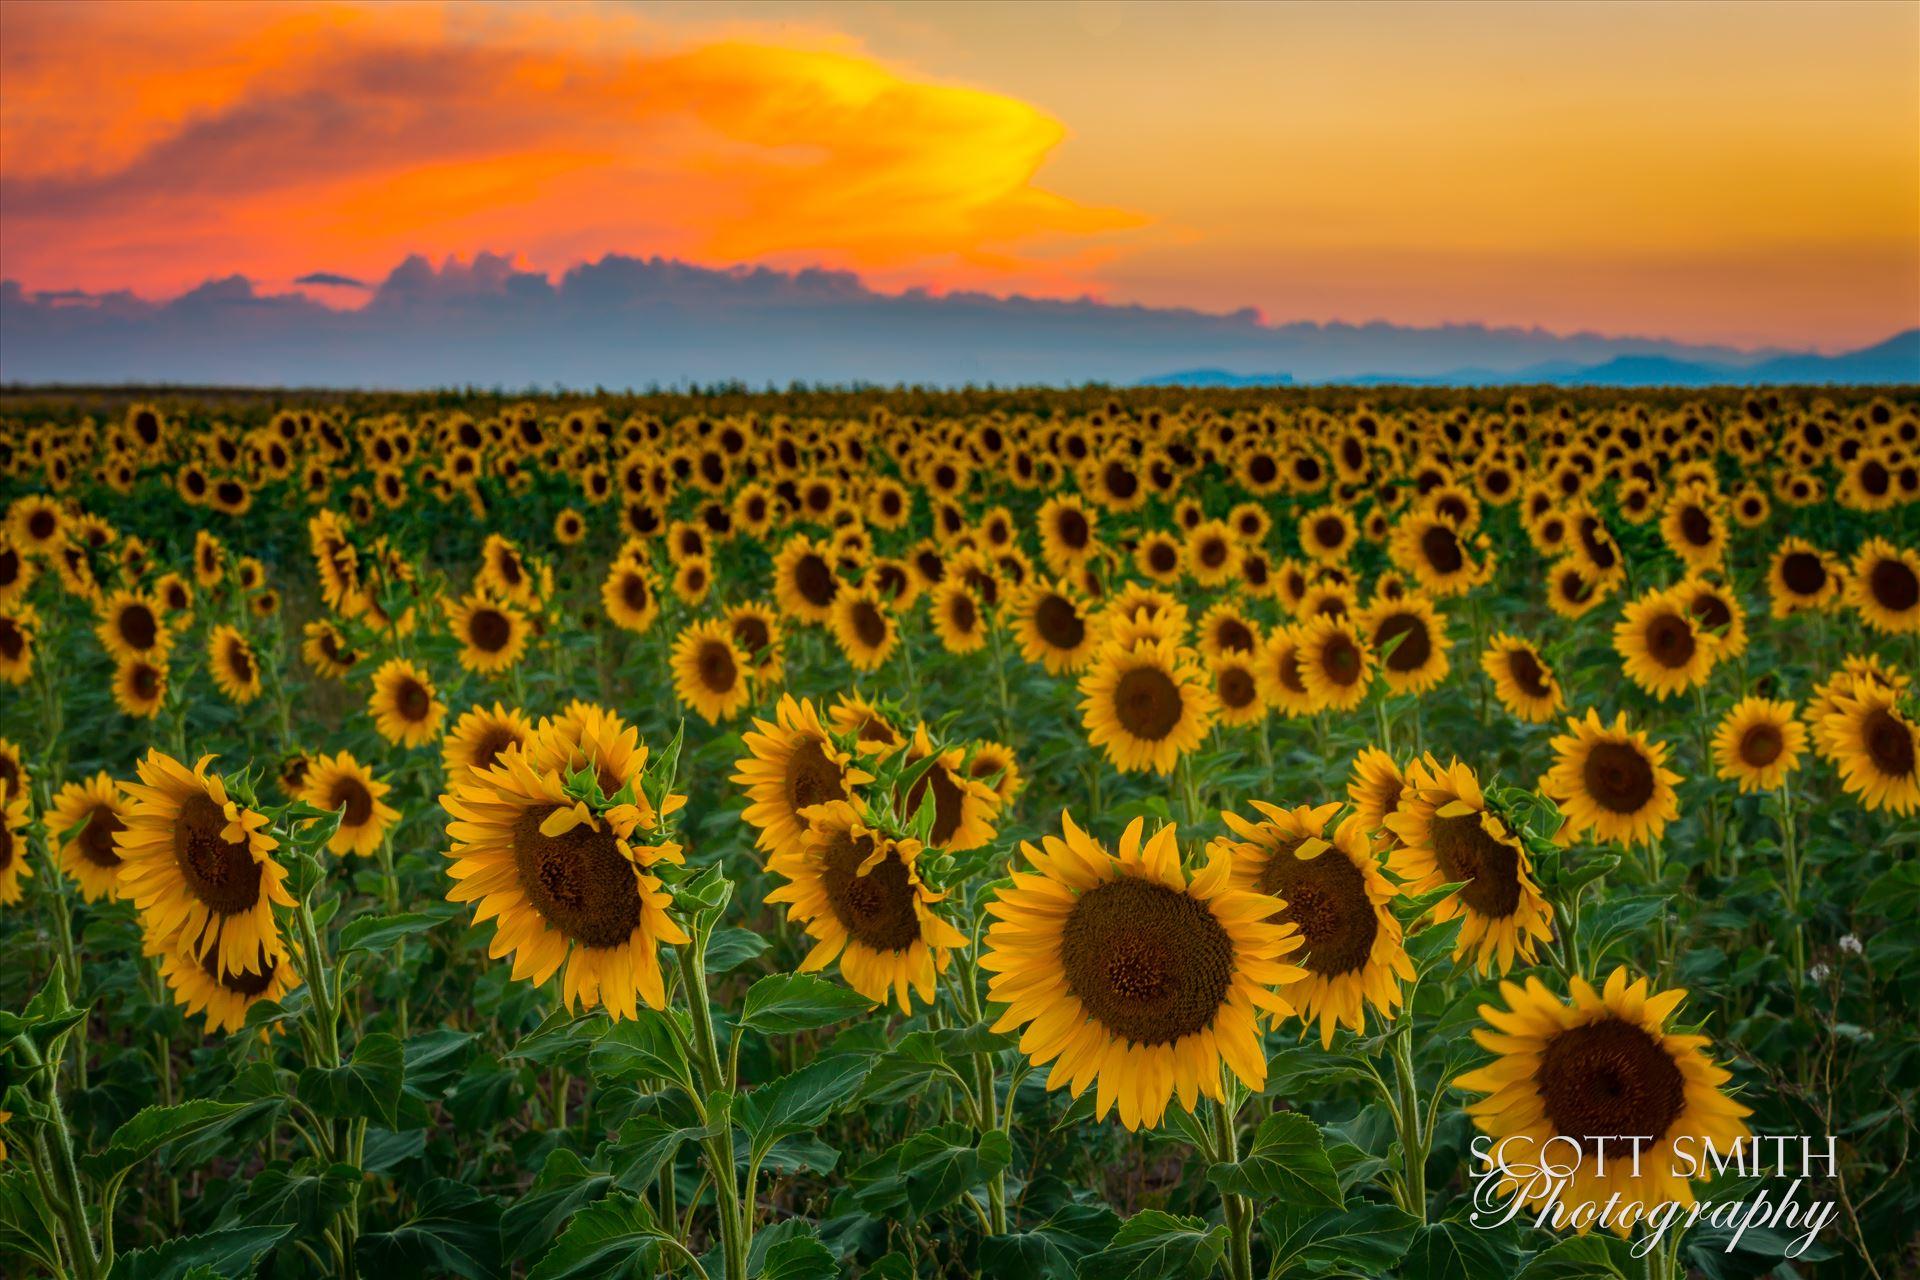 Denver Sunflowers at Sunset No 3 - Sunflower fields near Denver International Airport, on August 20th, 2016. Near 56th and E470. by D Scott Smith